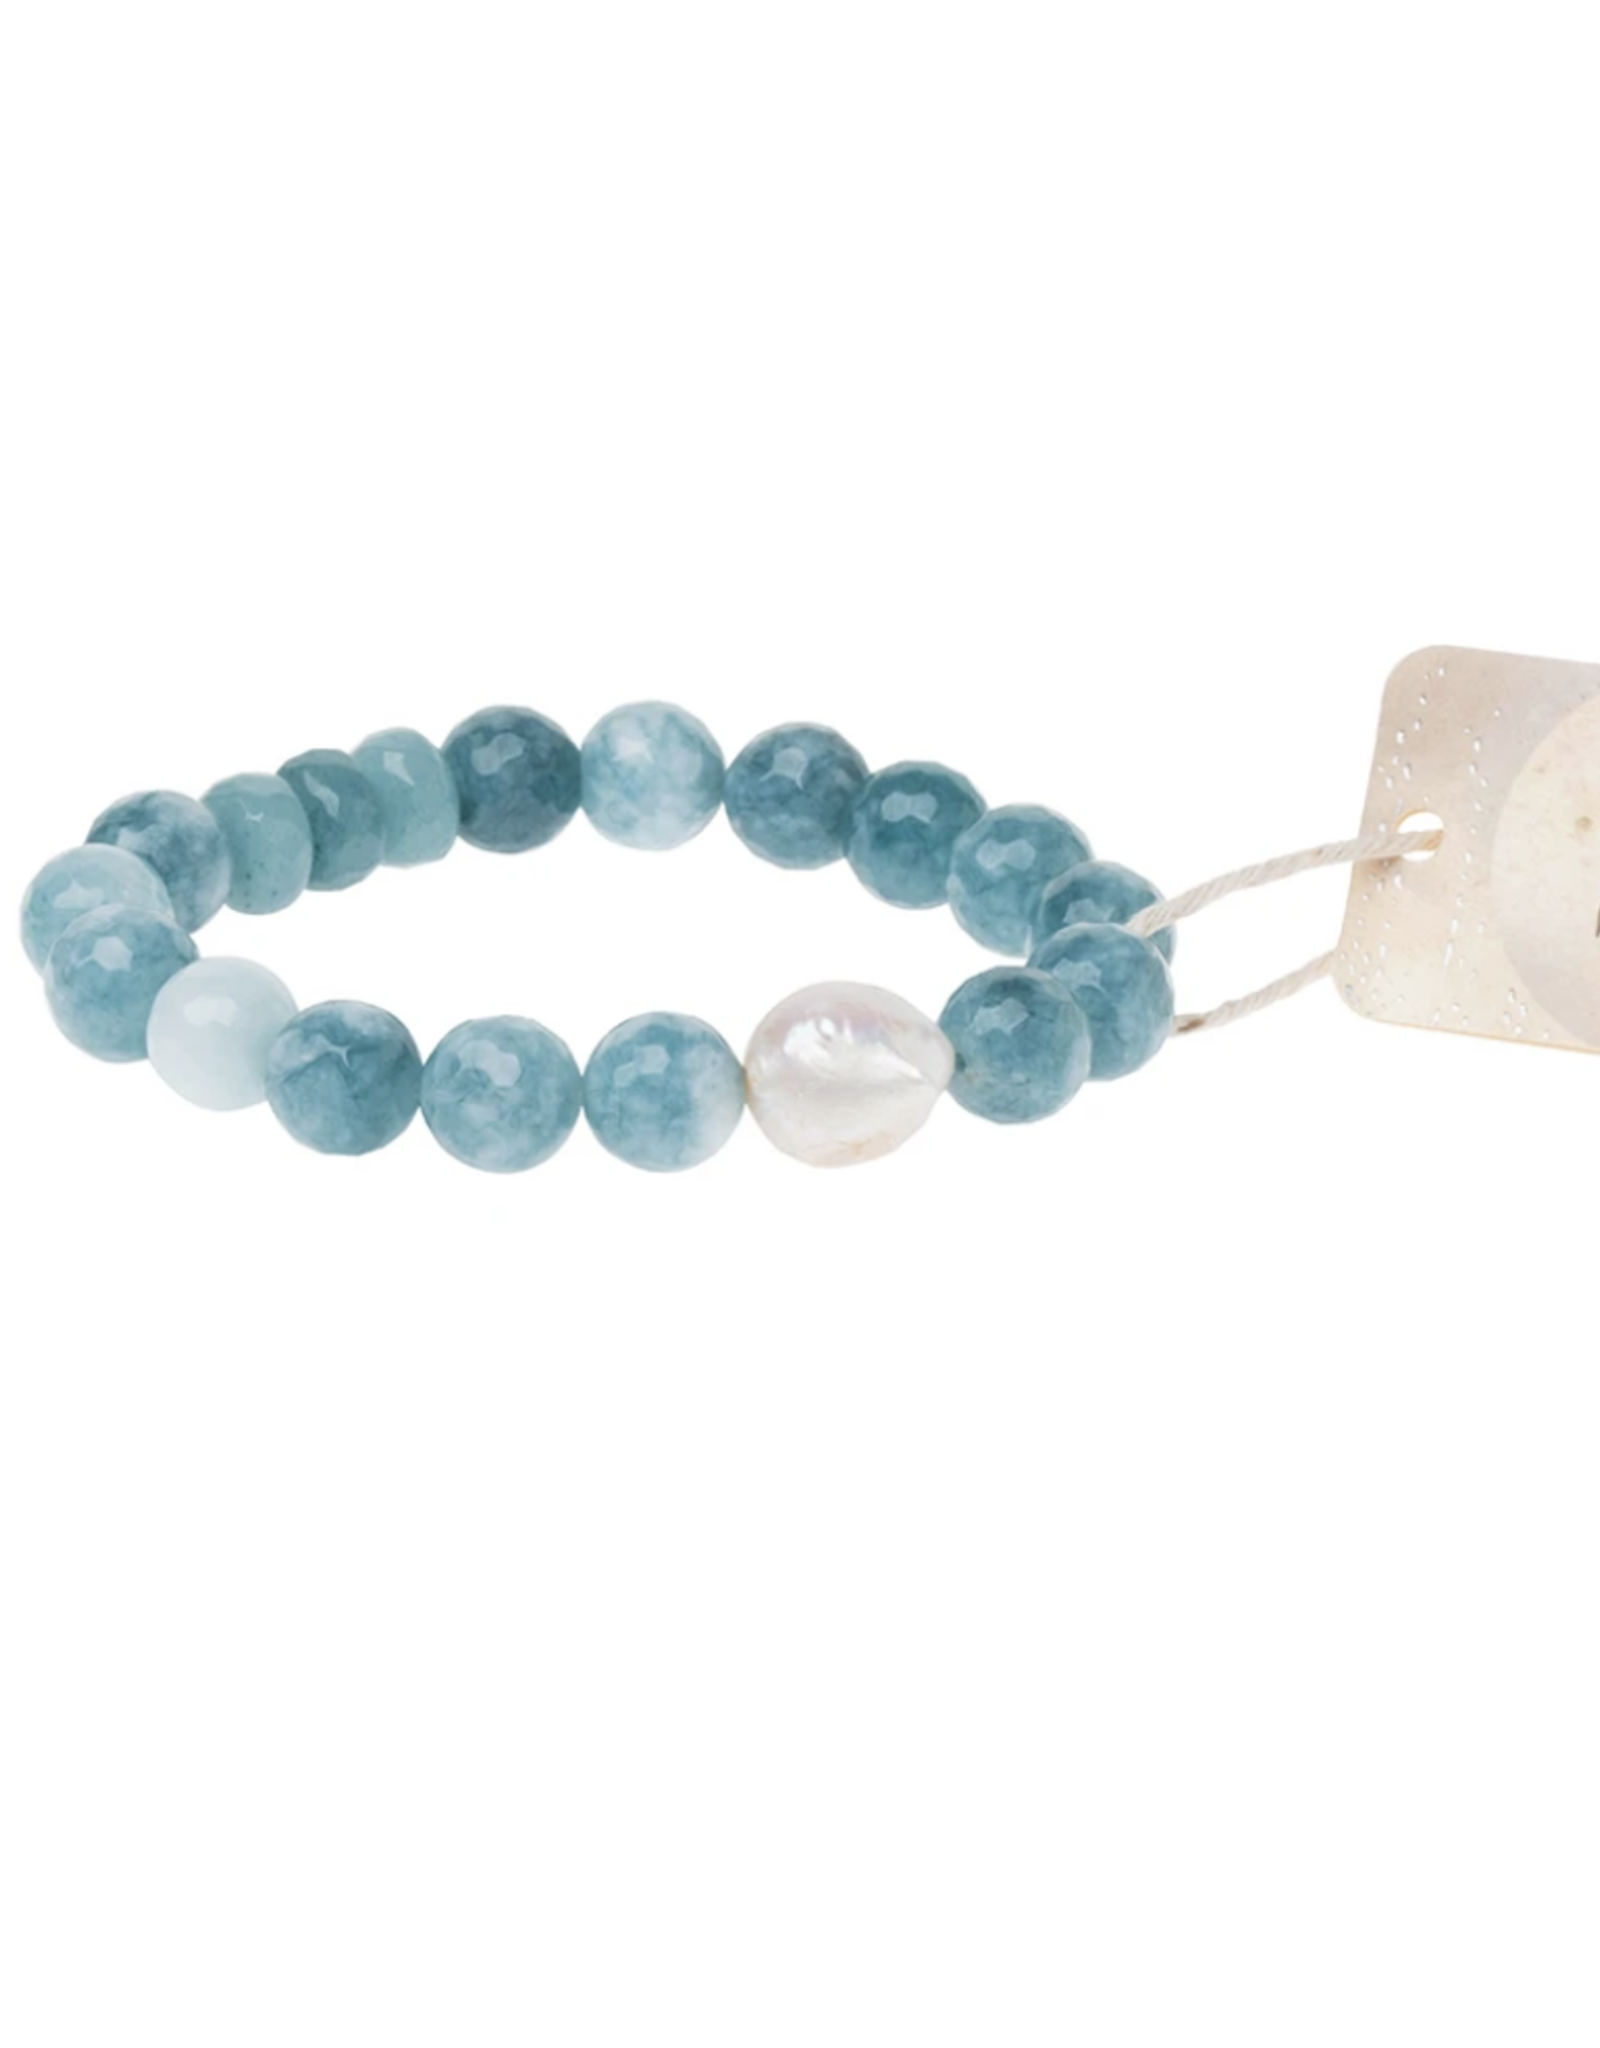 Pearl and Sea Blue Agate bracelet